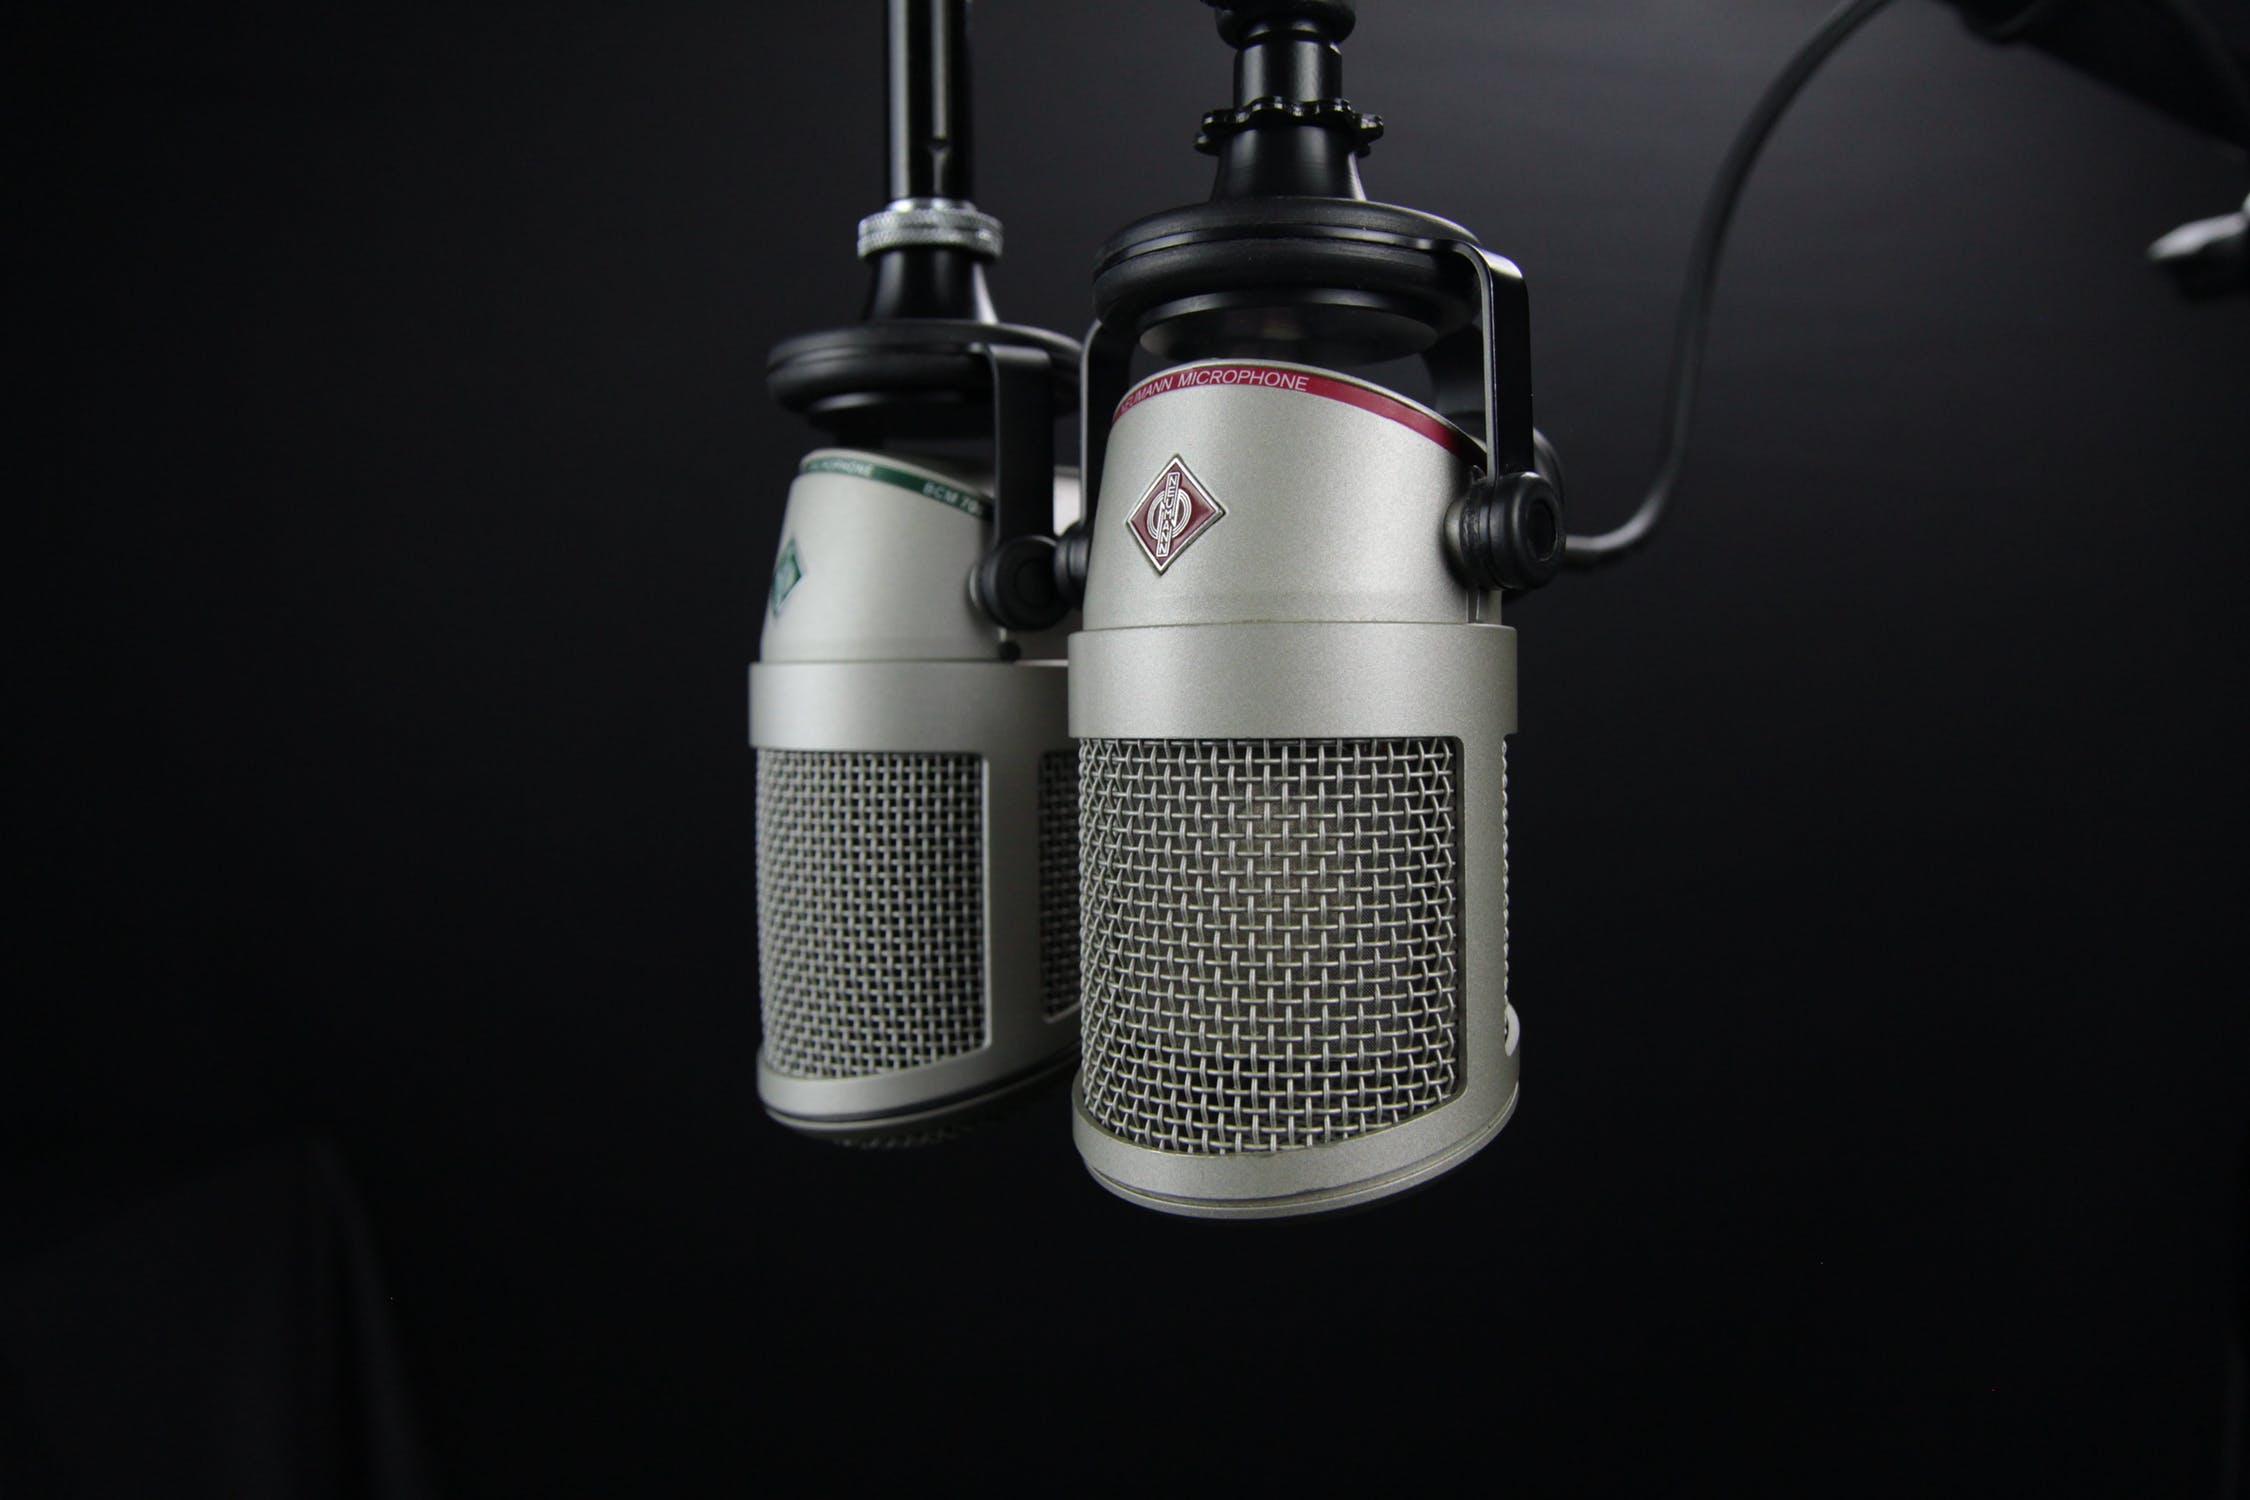 G. Seller On The Radio